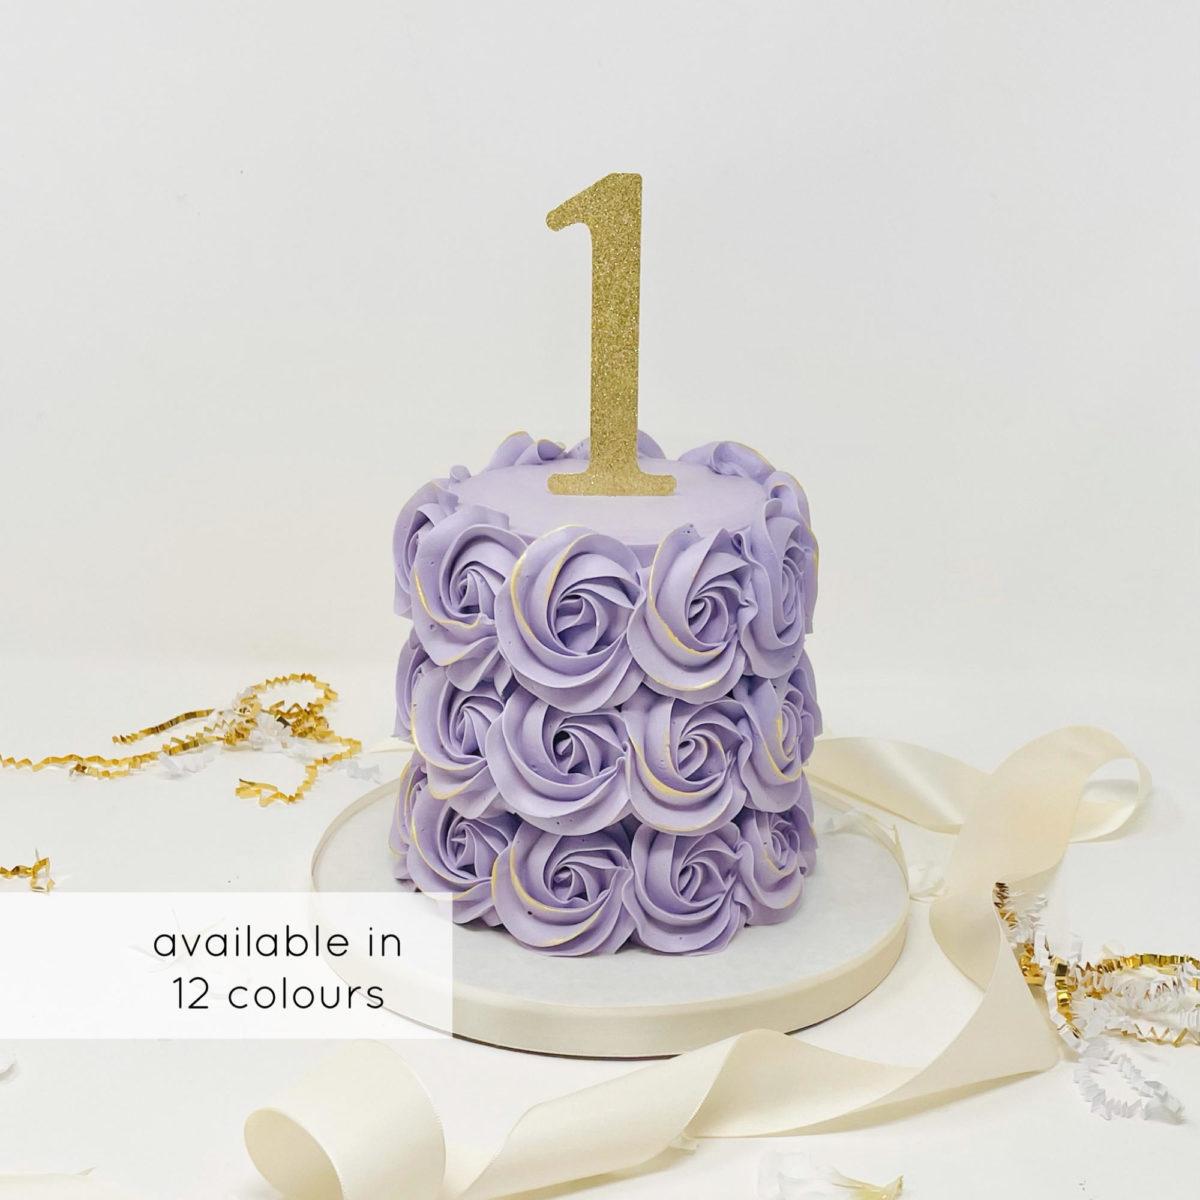 Luxe Rosette Smash Cake